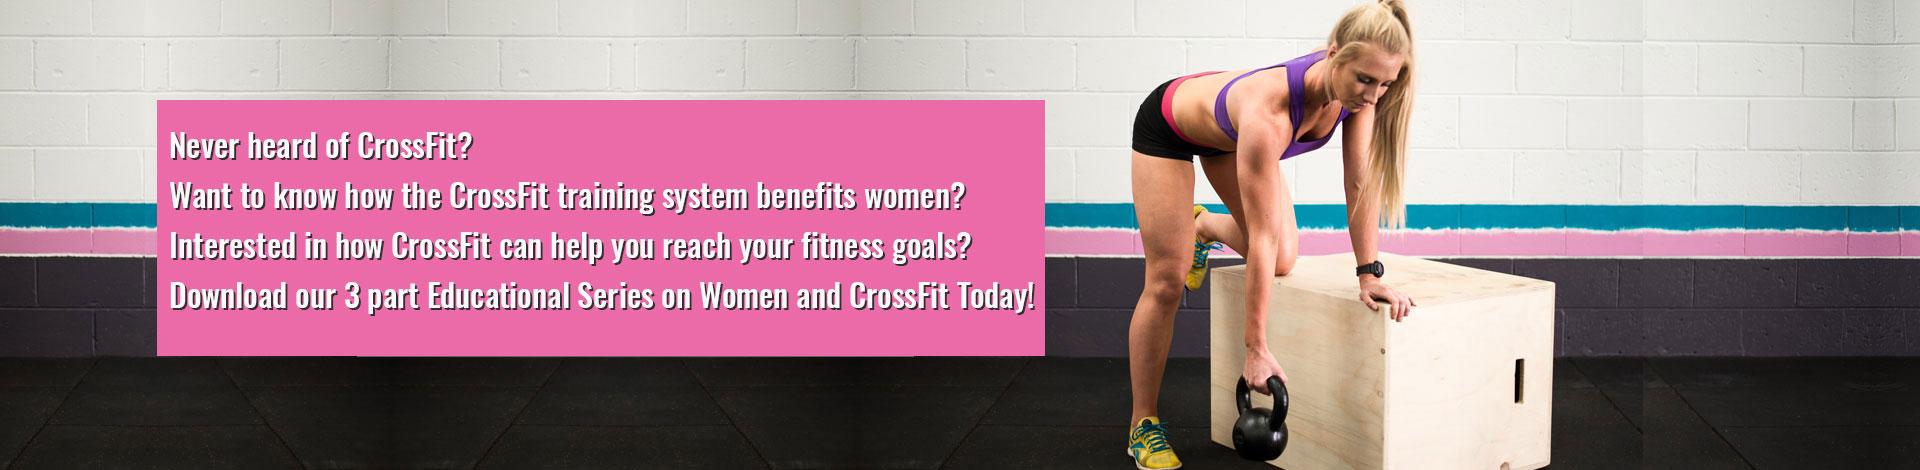 Women's fitness gym in sydney